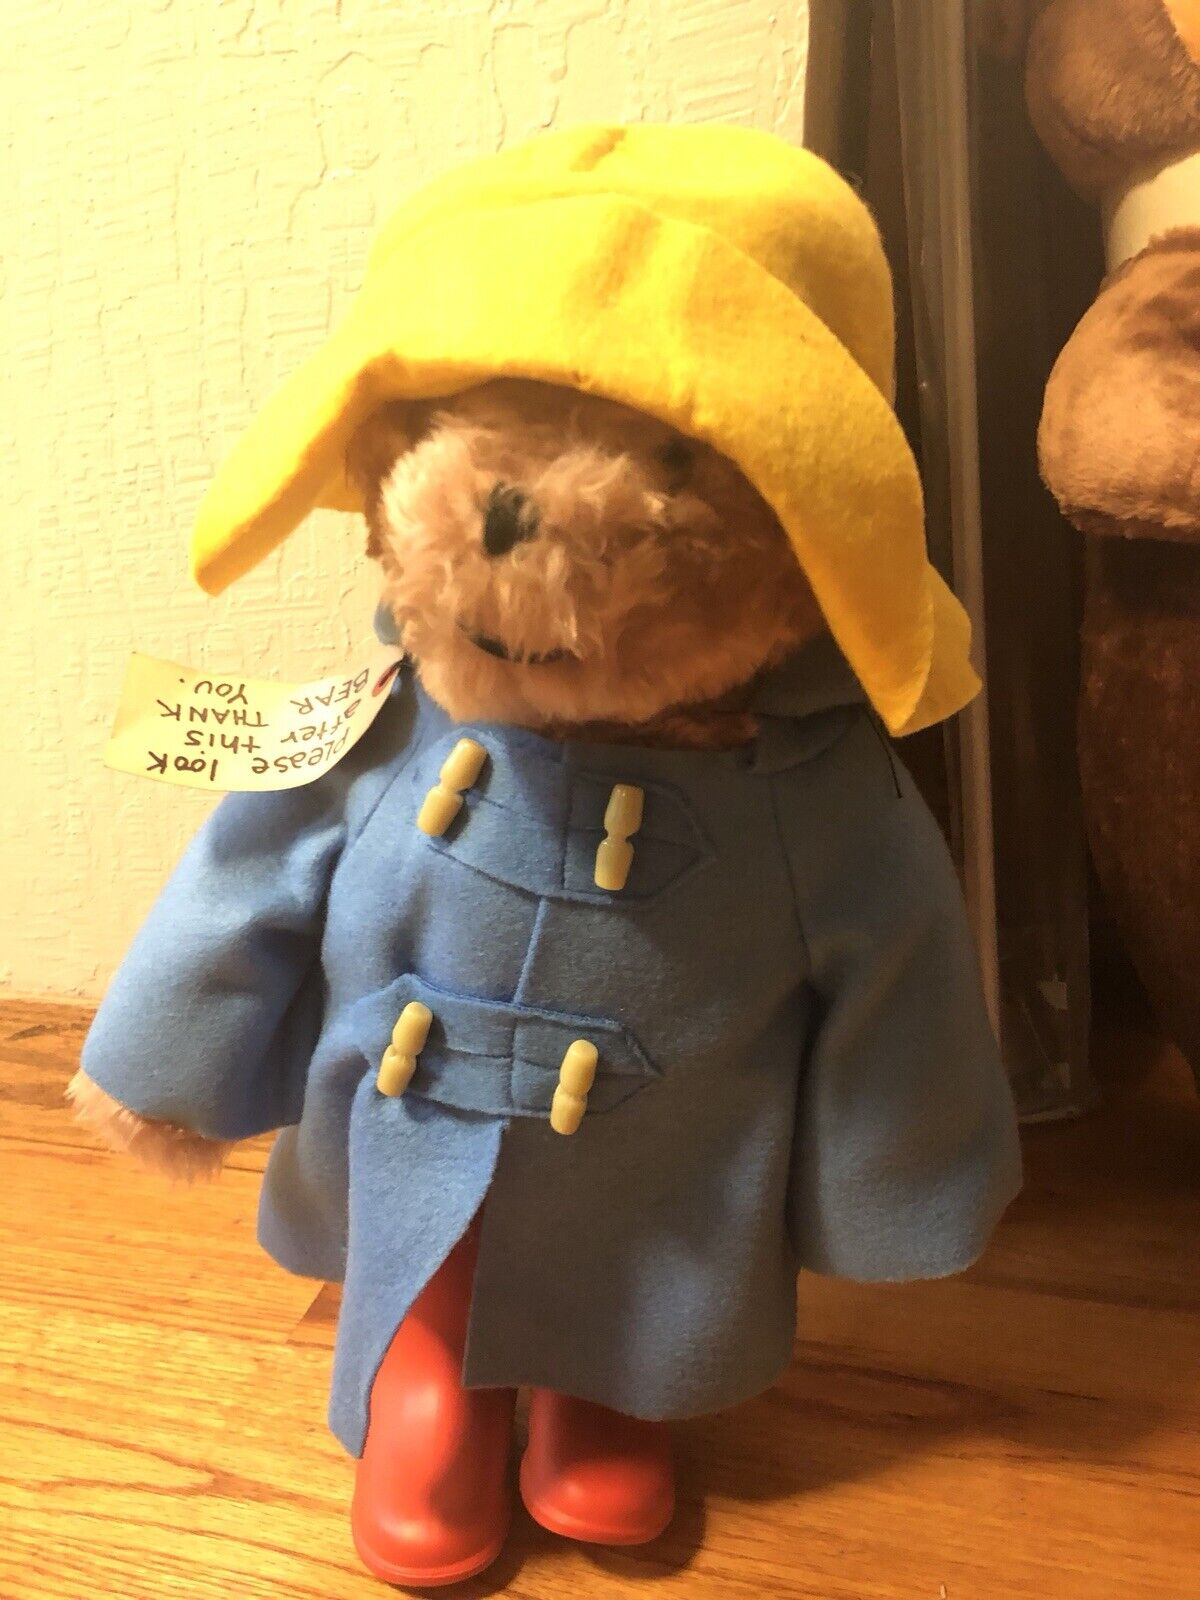 1975 Paddington Bear 20  rot Stiefel - Darkest Peru to London England Eden Toys